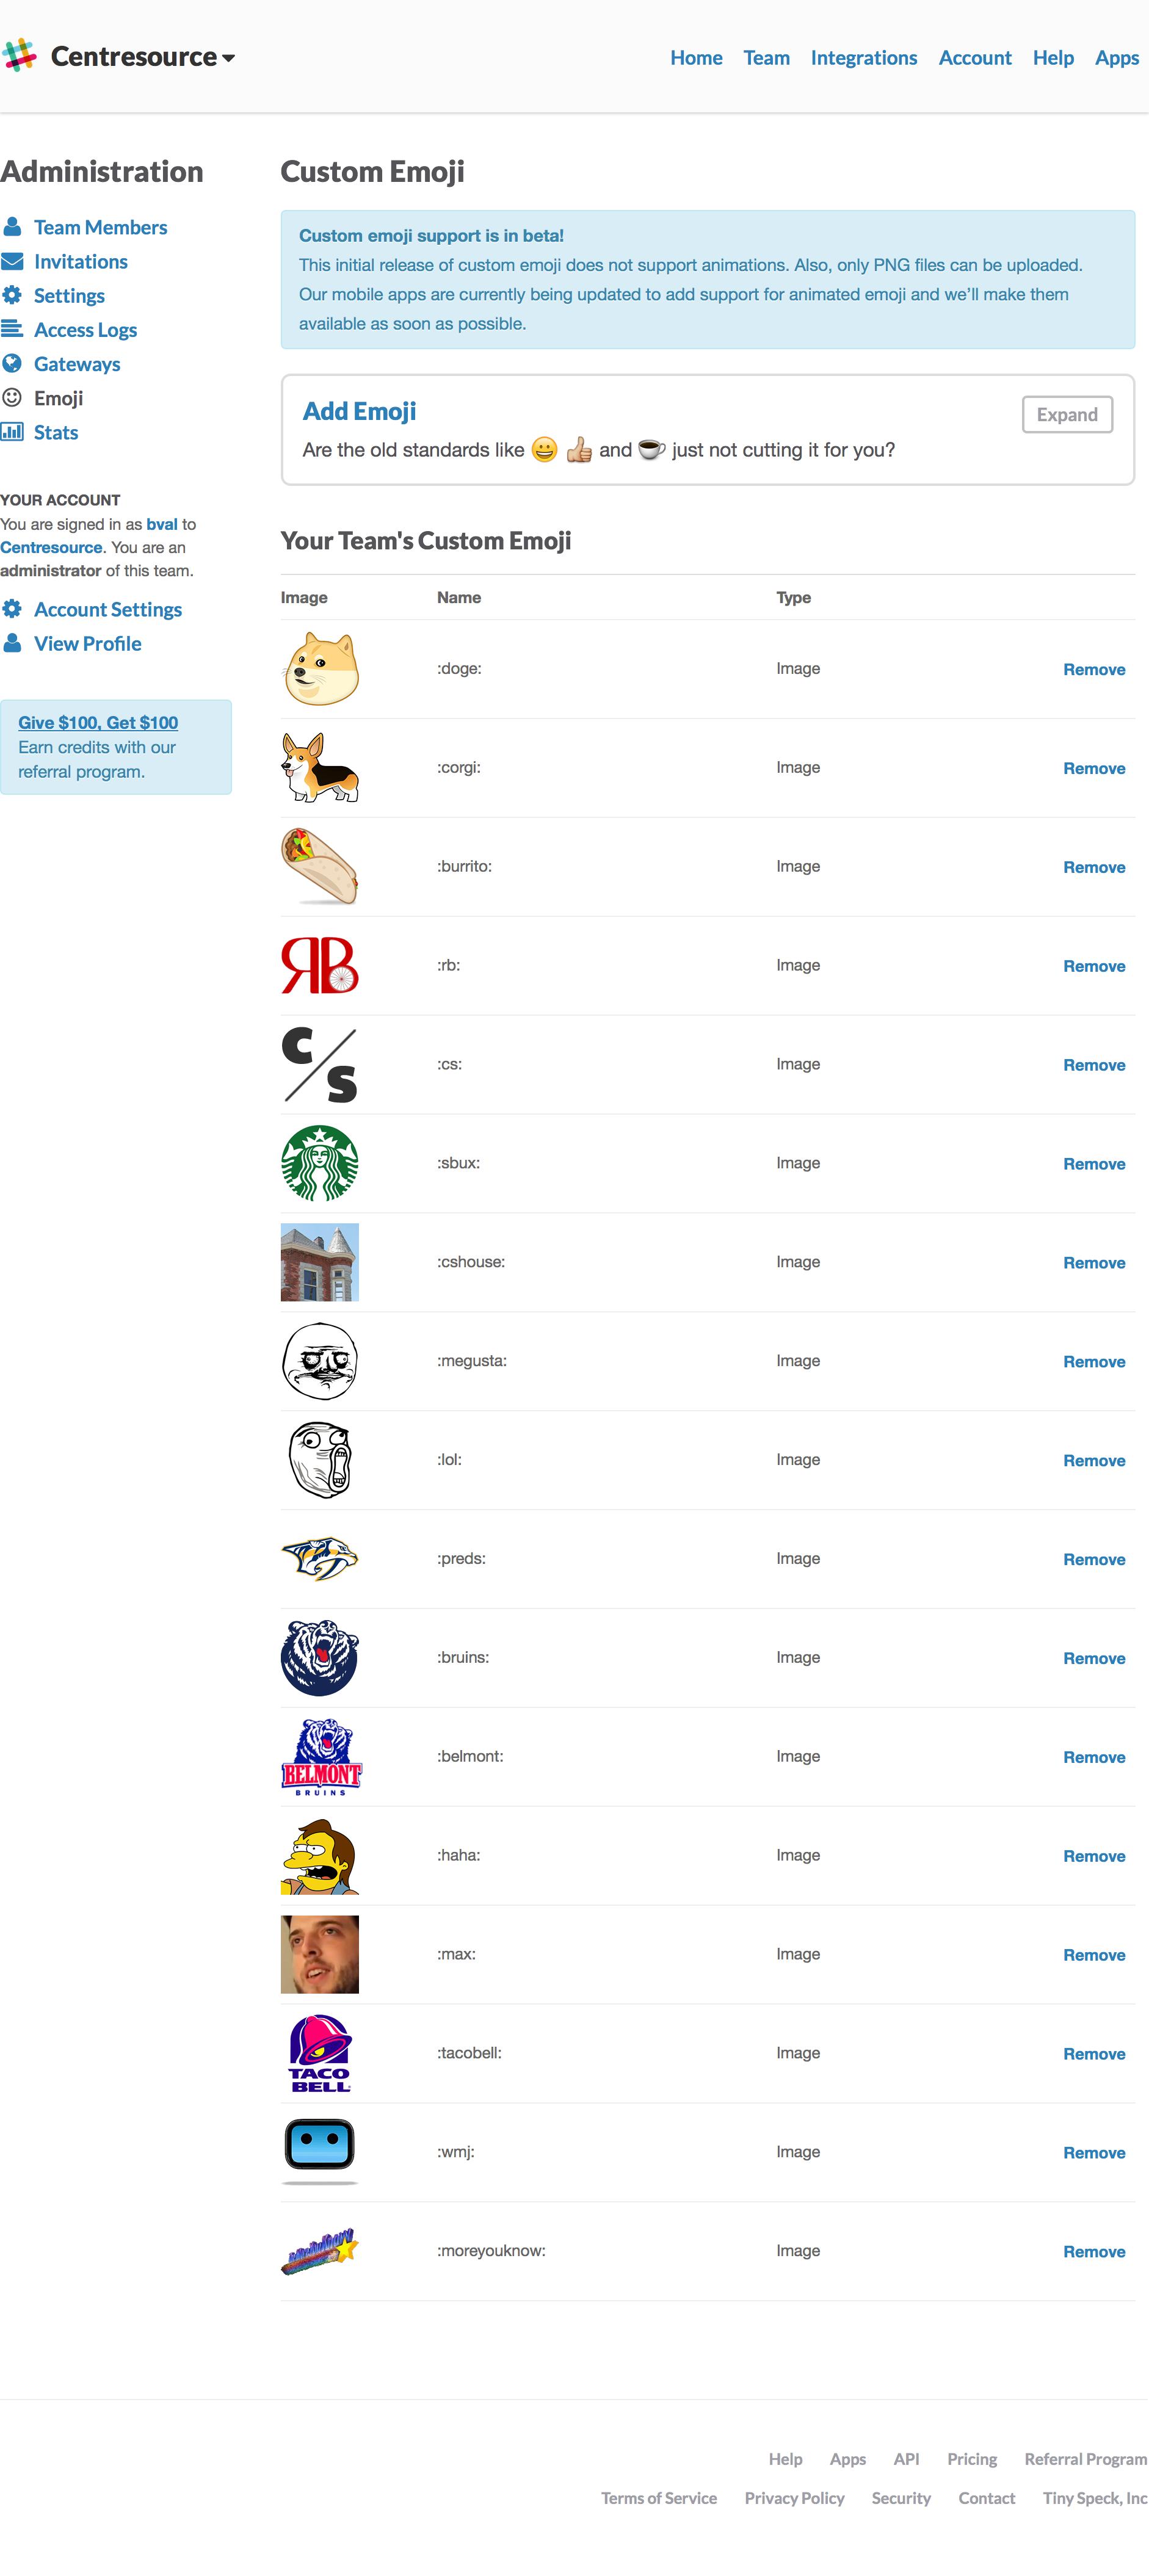 https://www.evernote.com/shard/s231/sh/b9802ba8-64a7-4497-9595-be099fbf10cf/24f3e06a818bdc29d707762941814109/deep/0/Custom-Emoji---Centresource-Slack-20140223.png